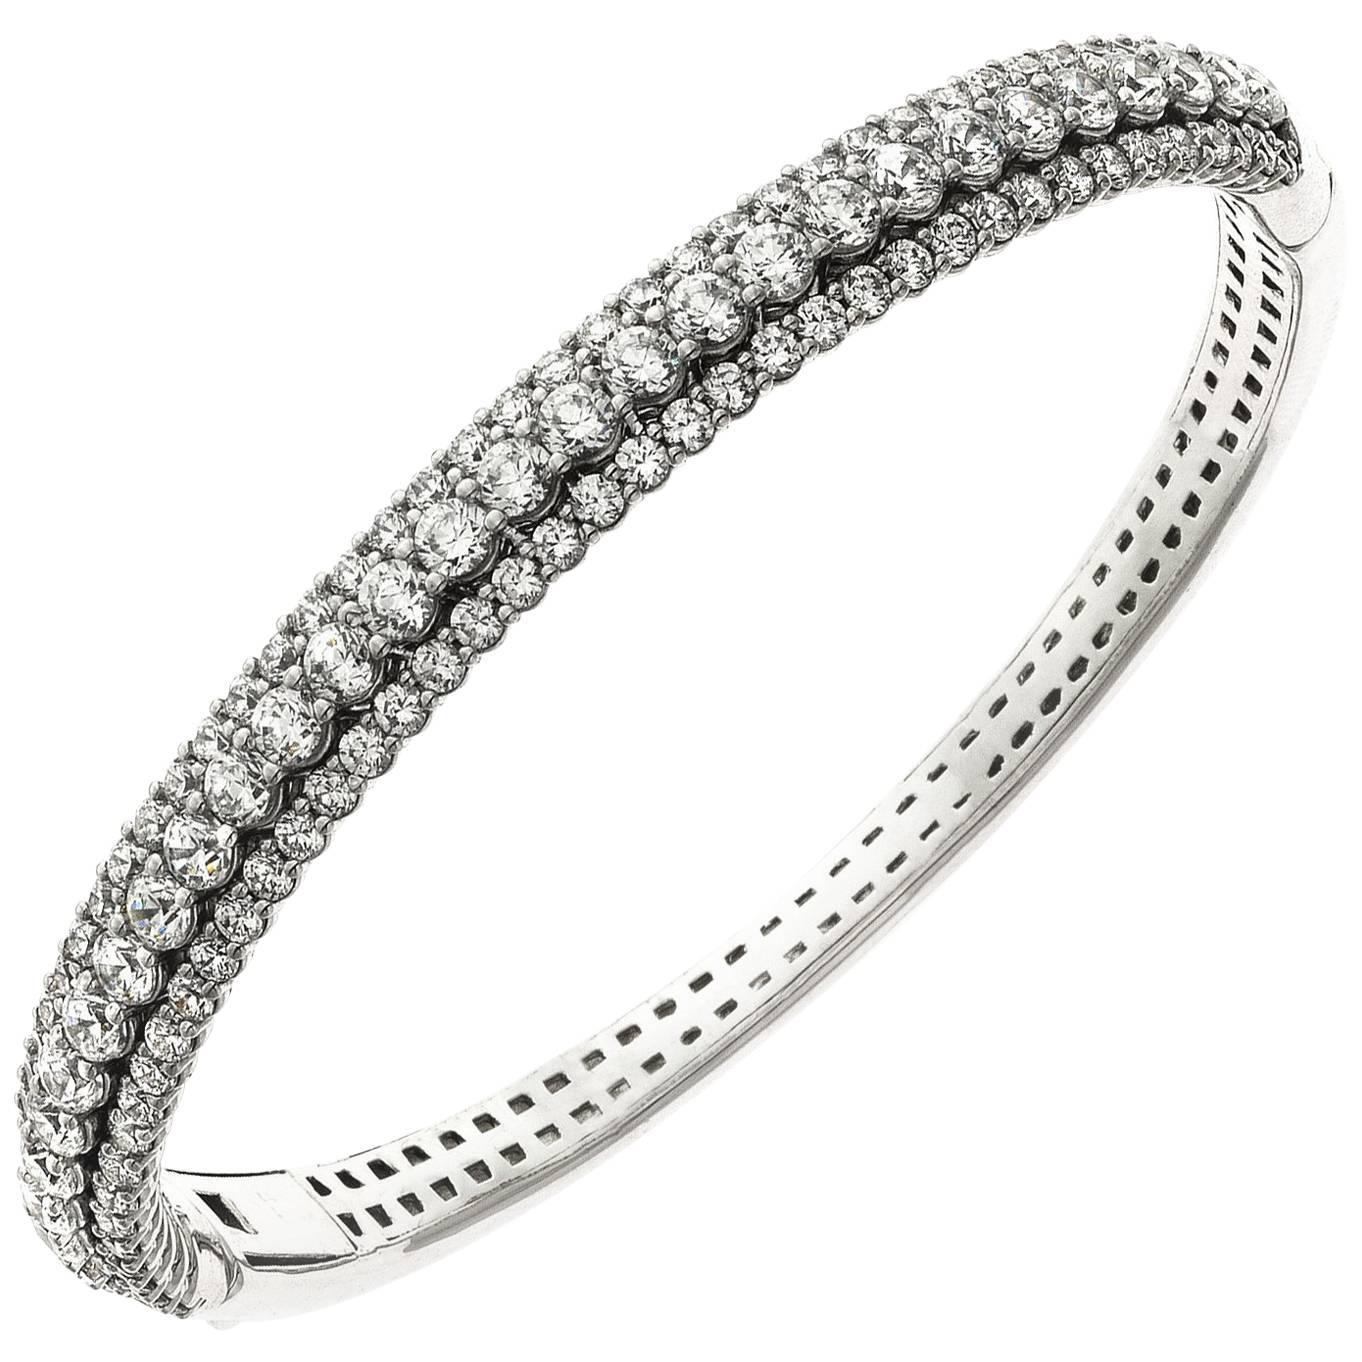 Emilio Jewelry 7.50 Carat Diamond Bangle Bracelet